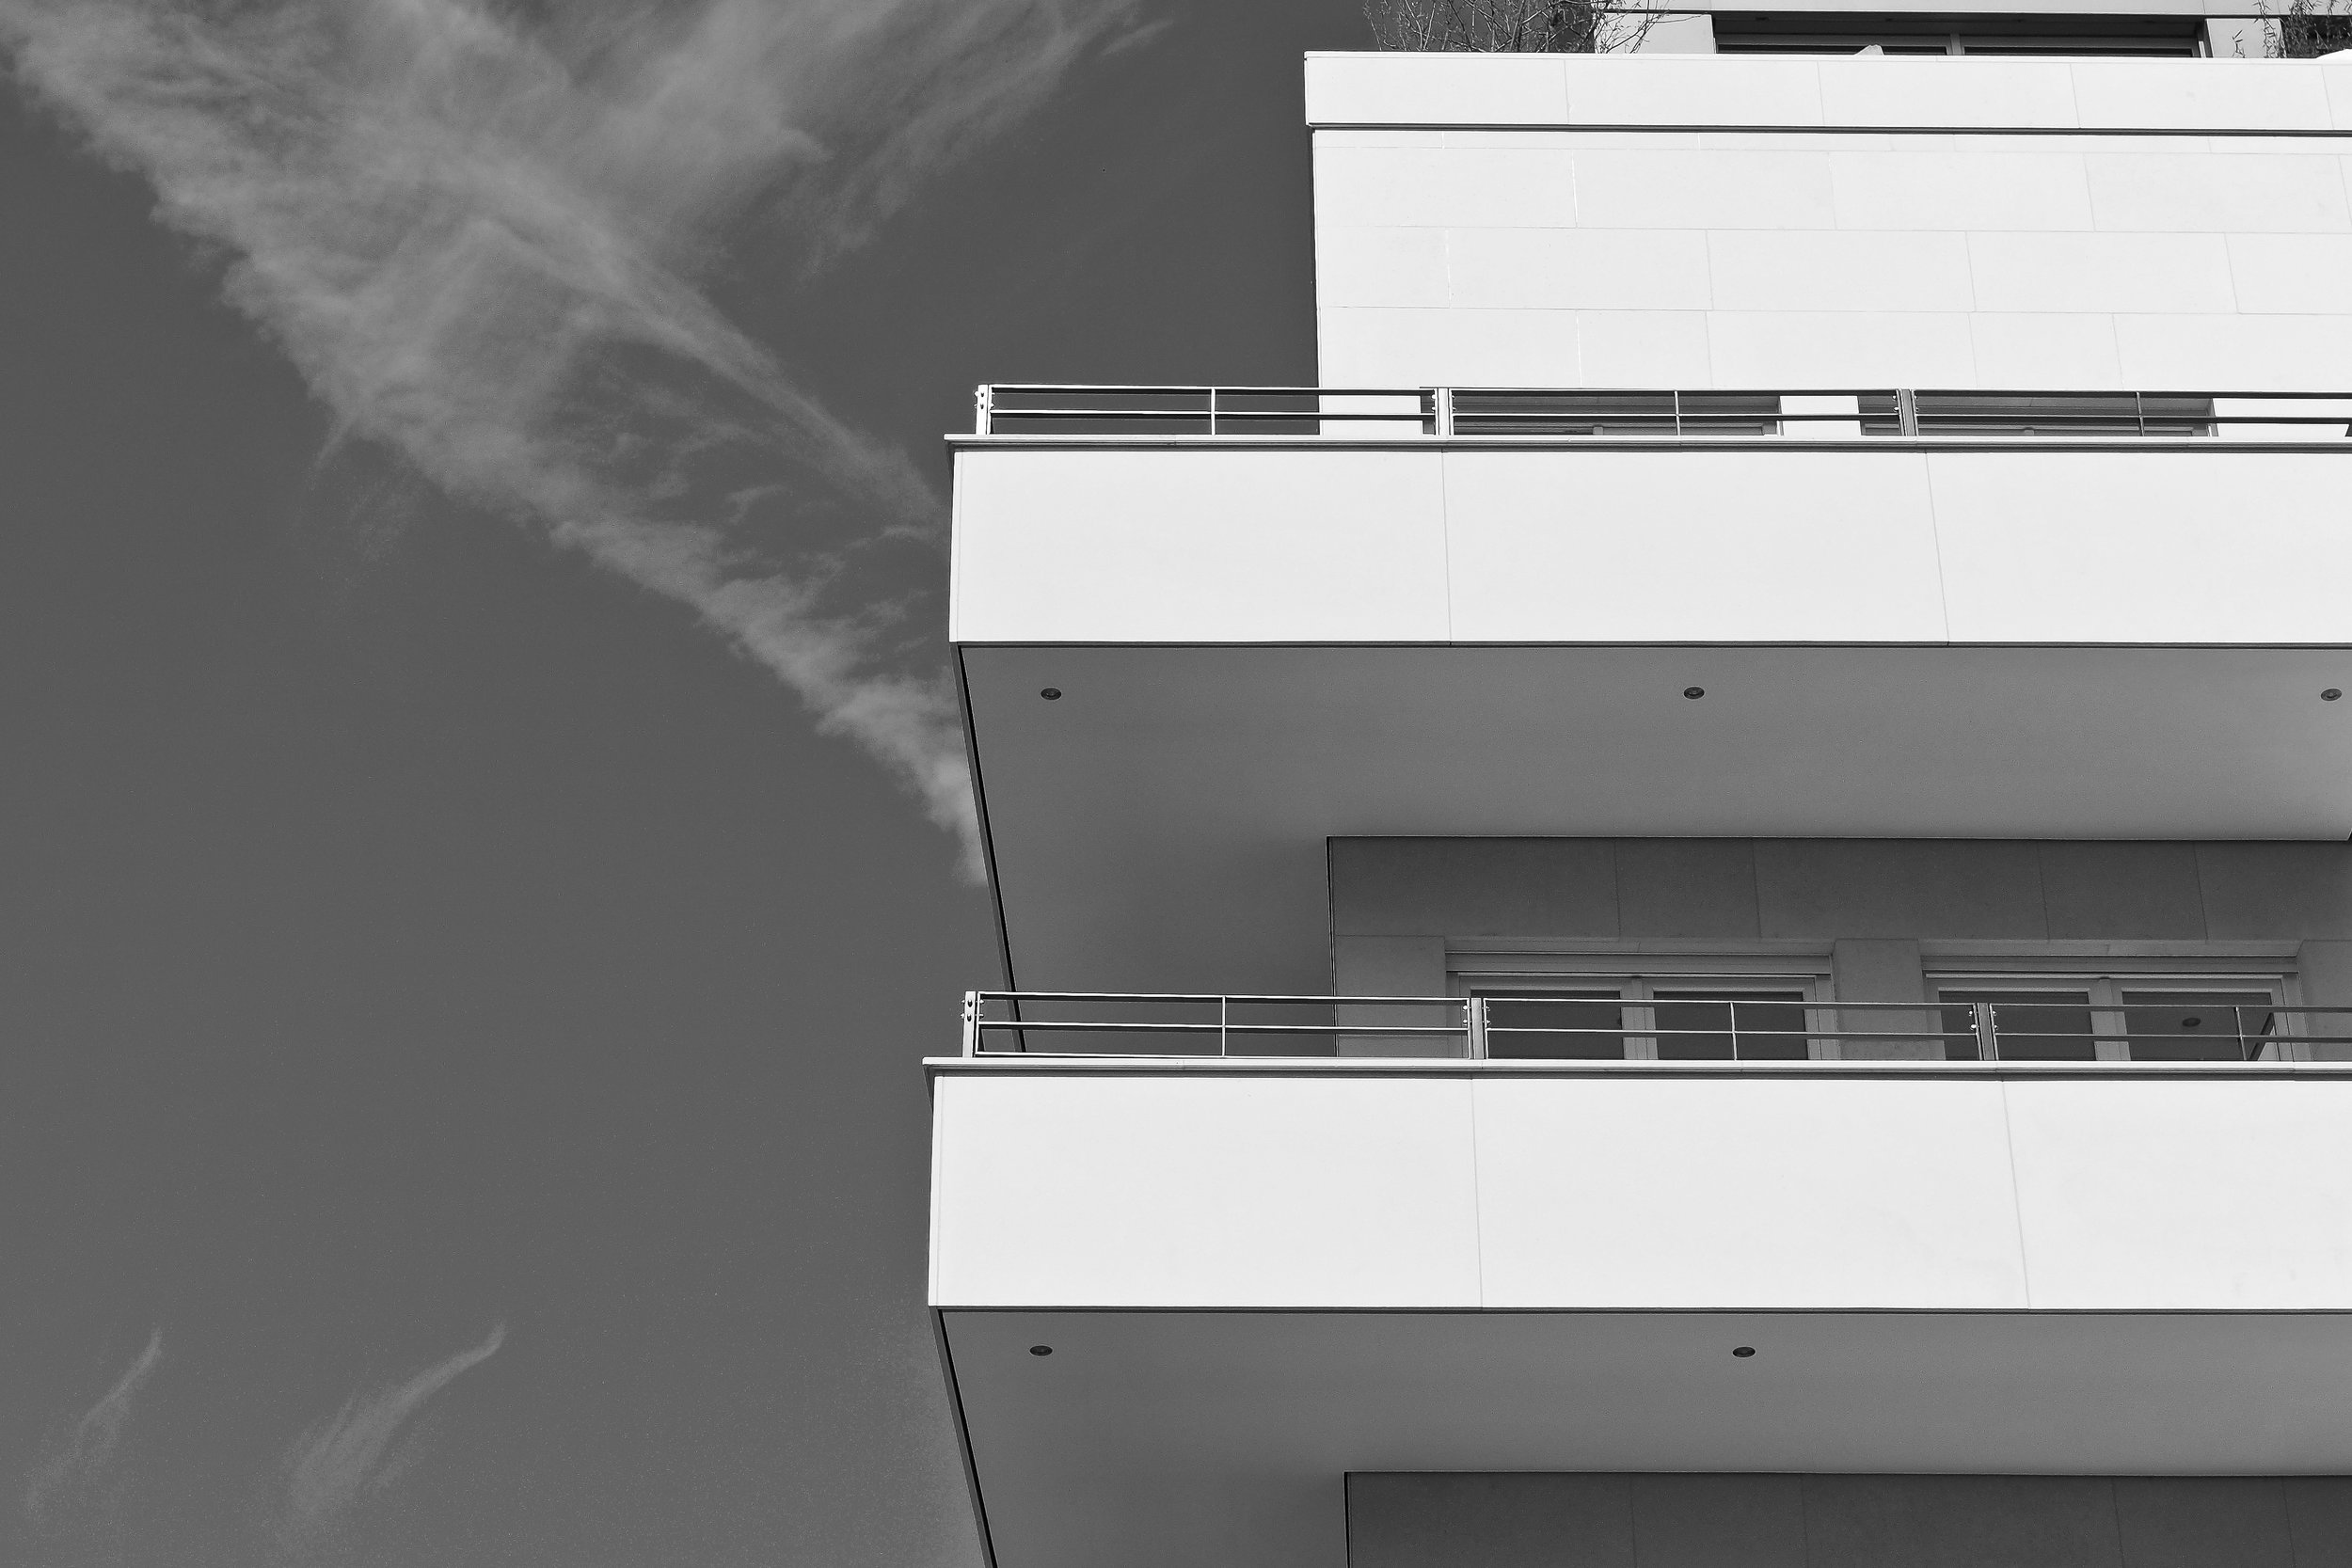 Property Loss Apartment